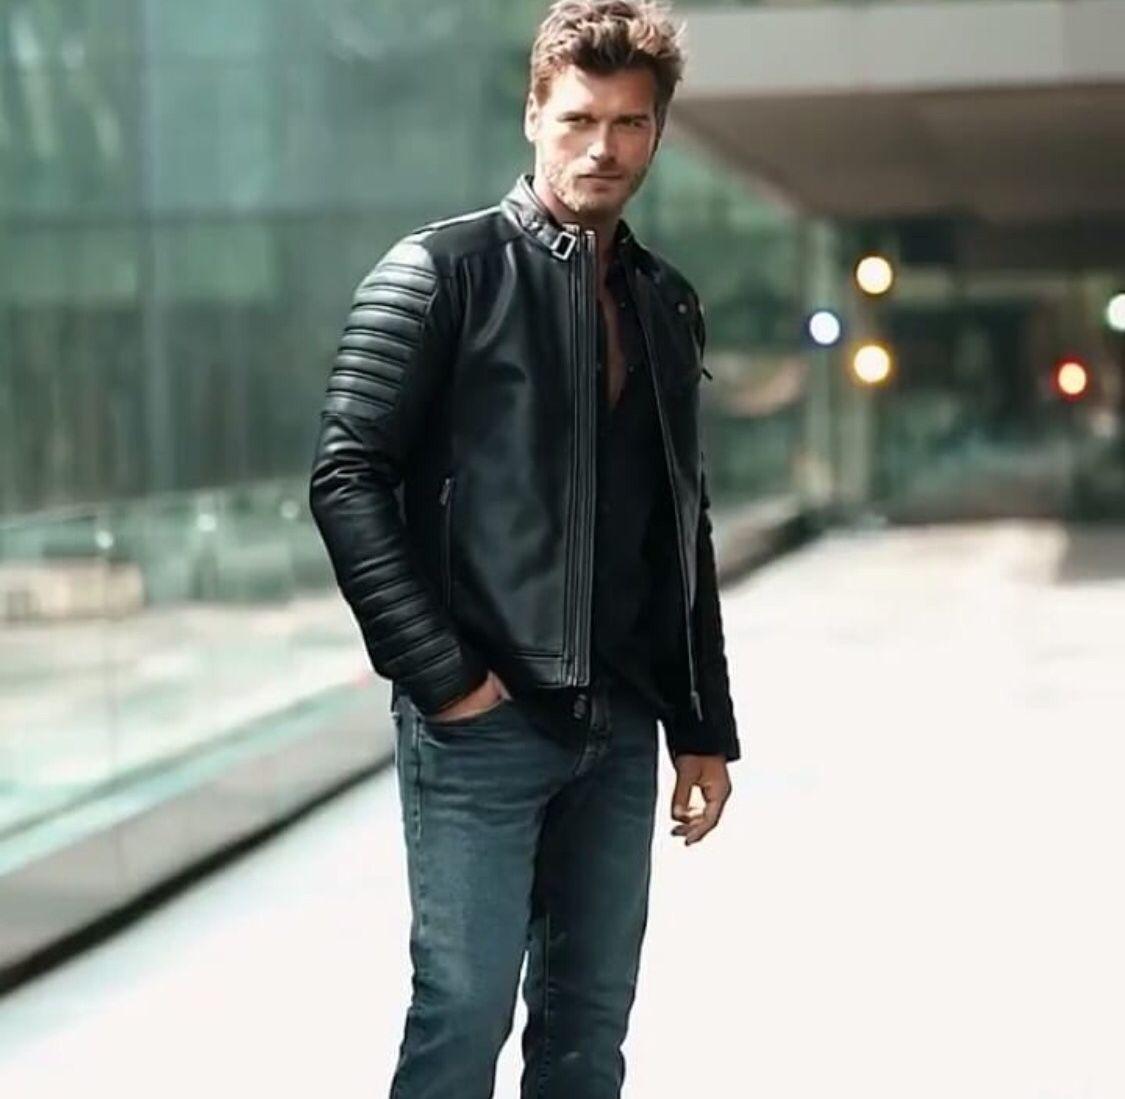 Pin By Kivanc Tatlitug North America On Kivanc Tatlitug Fashion Leather Jacket Turkish Actors [ 1099 x 1125 Pixel ]